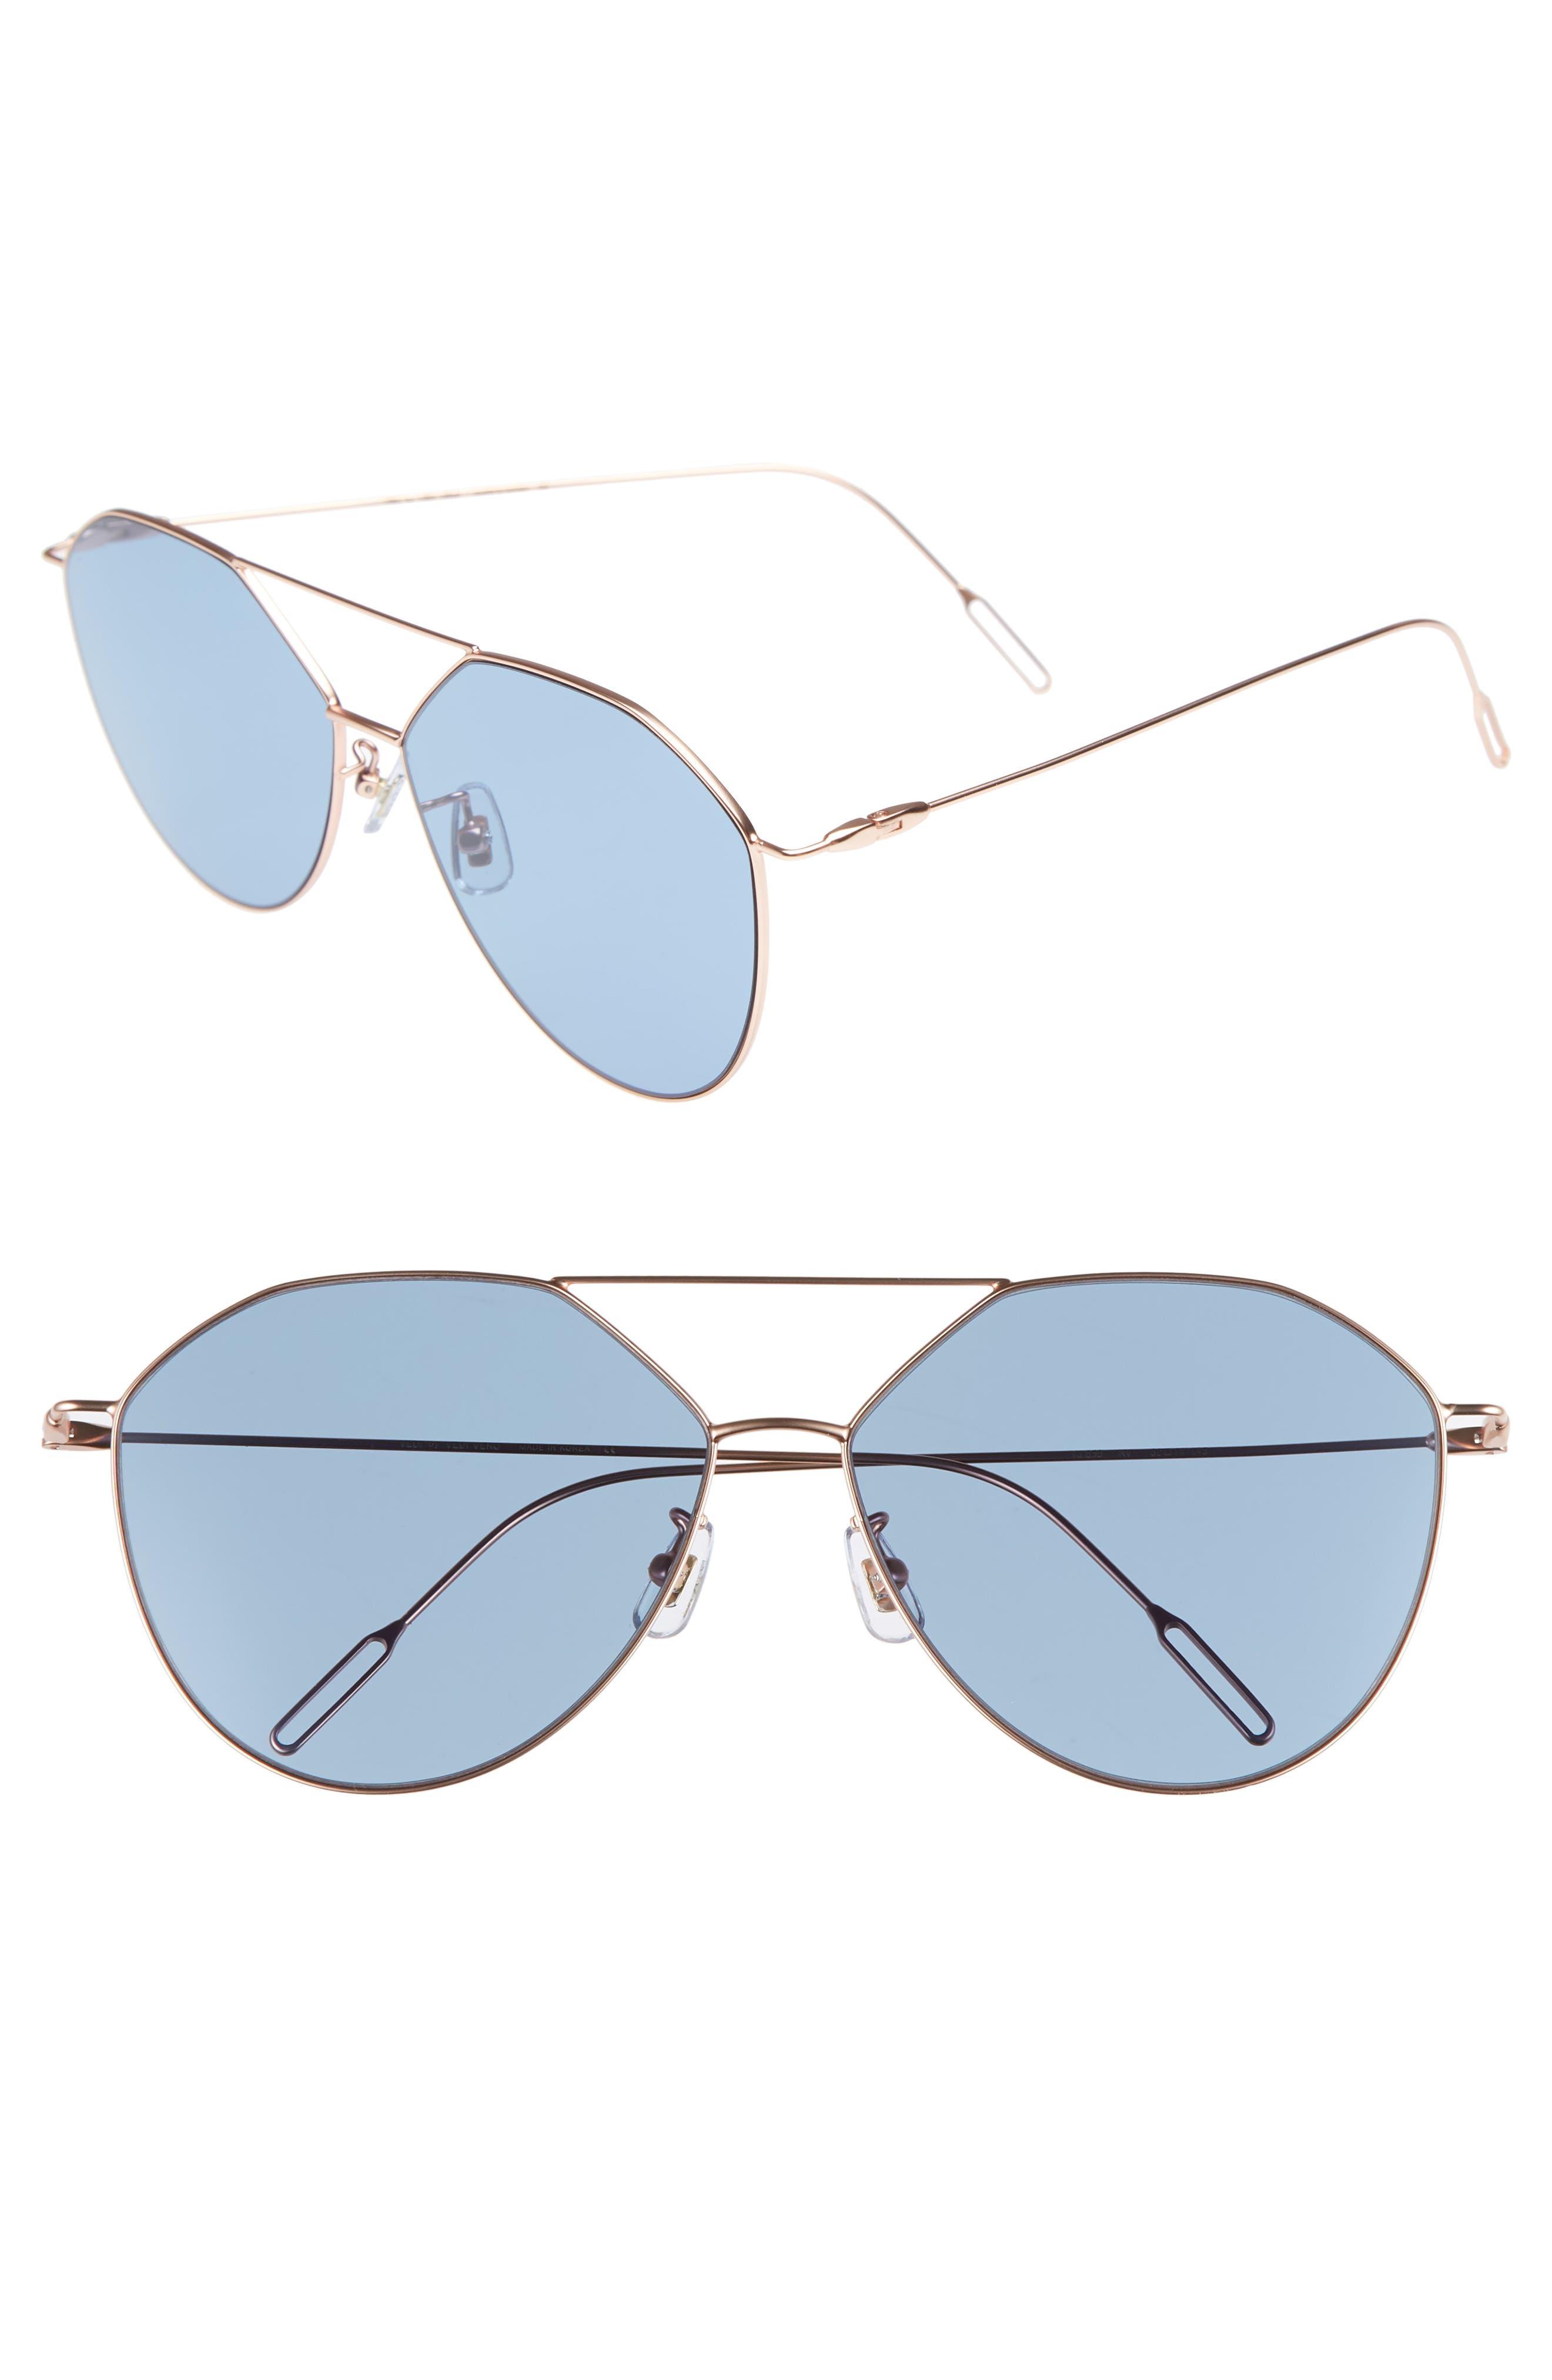 62mm Metal Oversize Aviator Sunglasses,                         Main,                         color, ROSE GOLD/NAVY